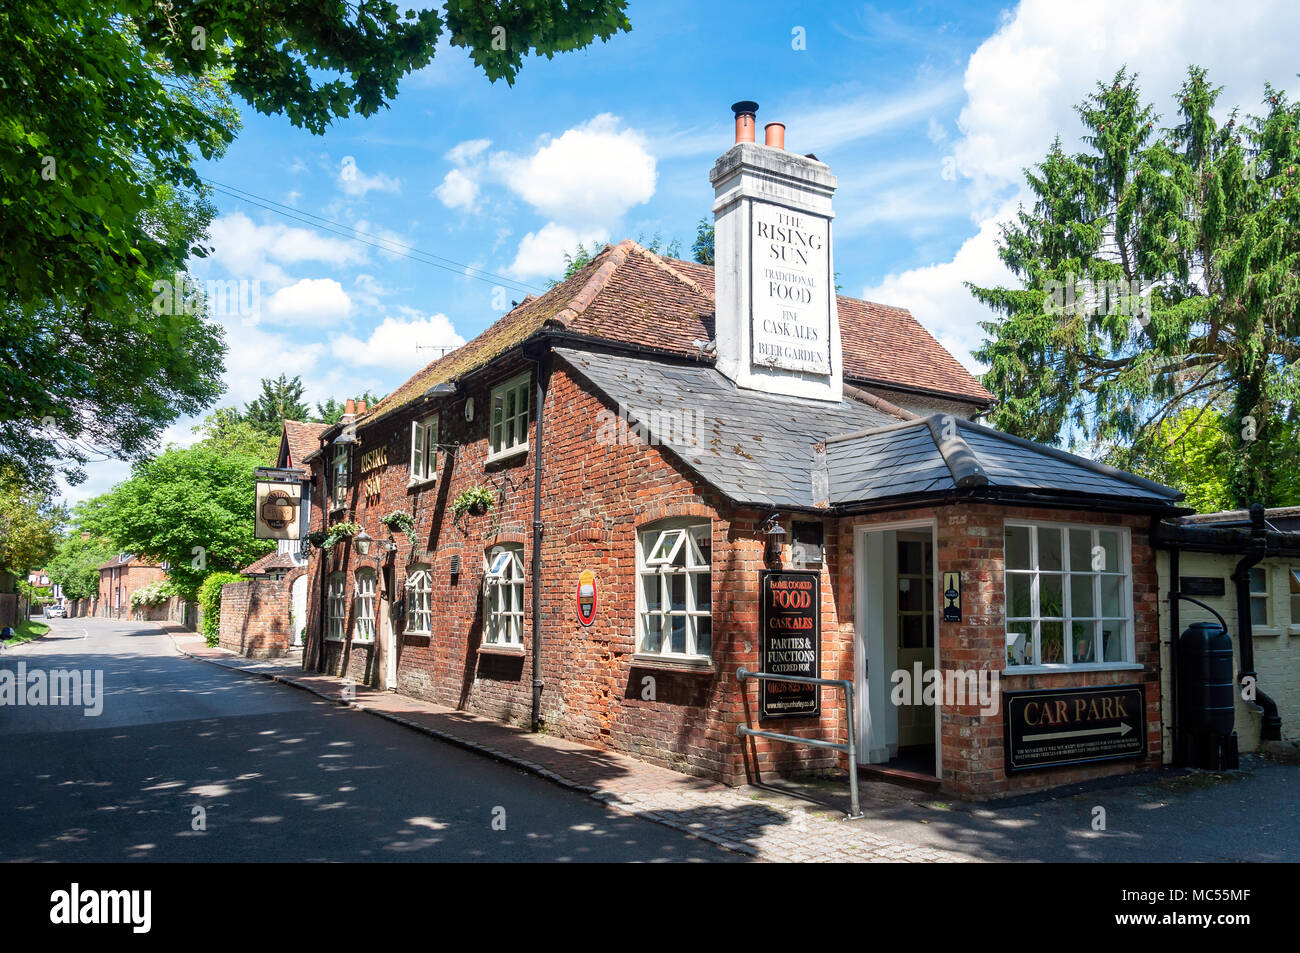 19th century The Rising Sun Pub, High Street, Hurley, Berkshire, England, United Kingdom - Stock Image